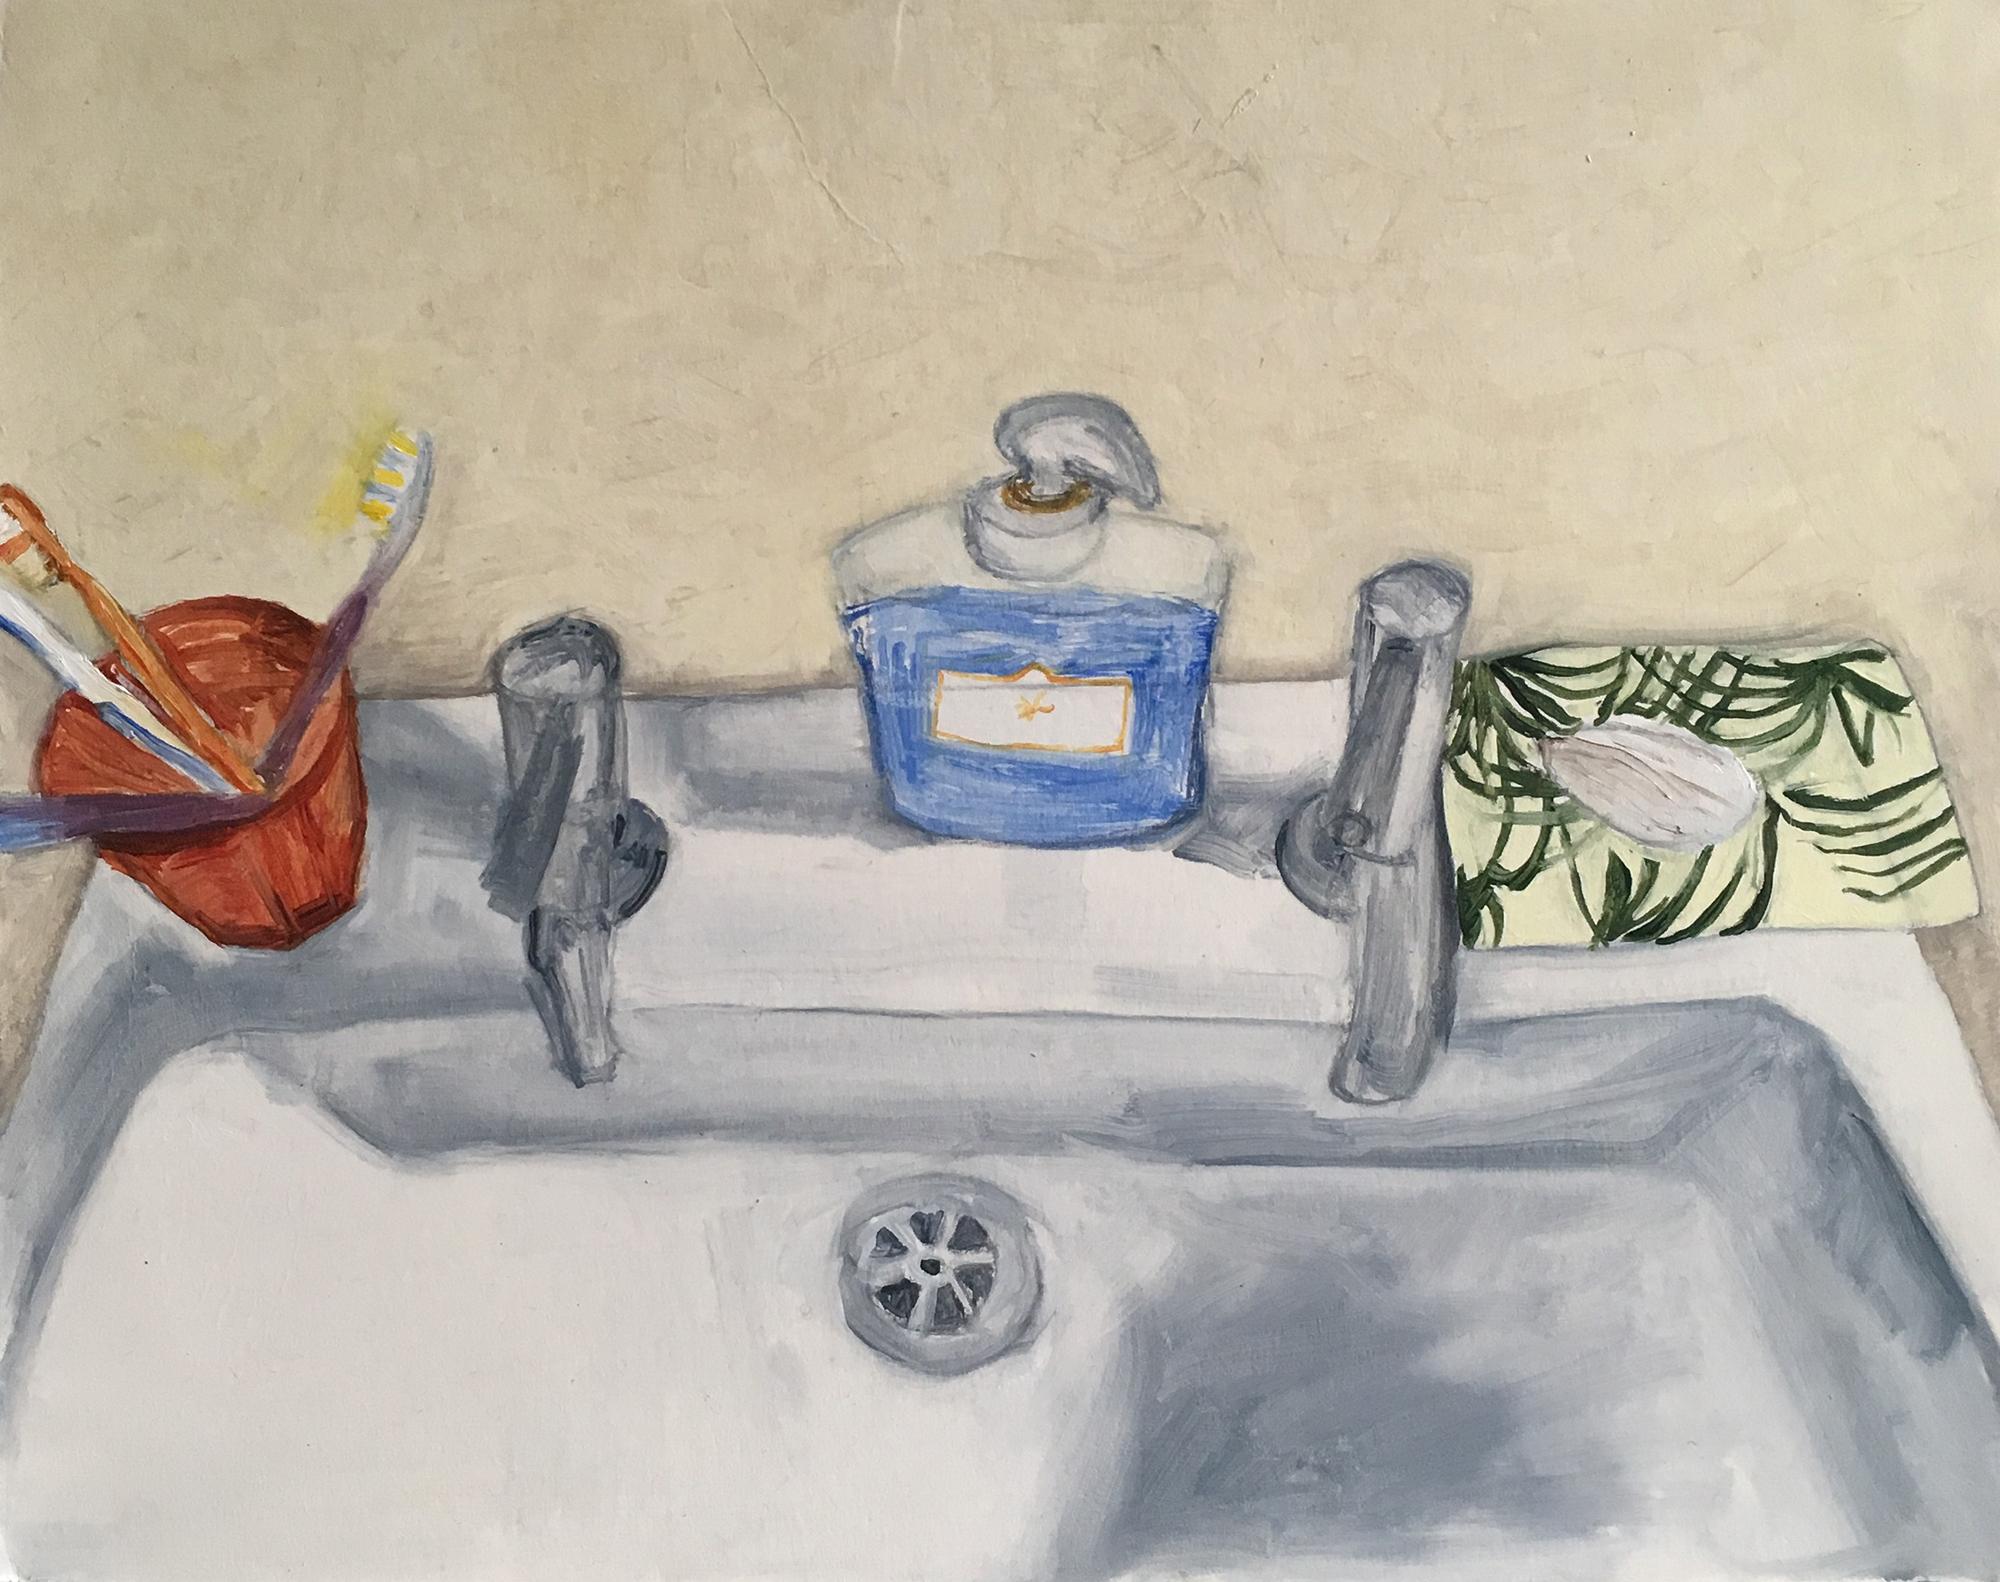 Sink life